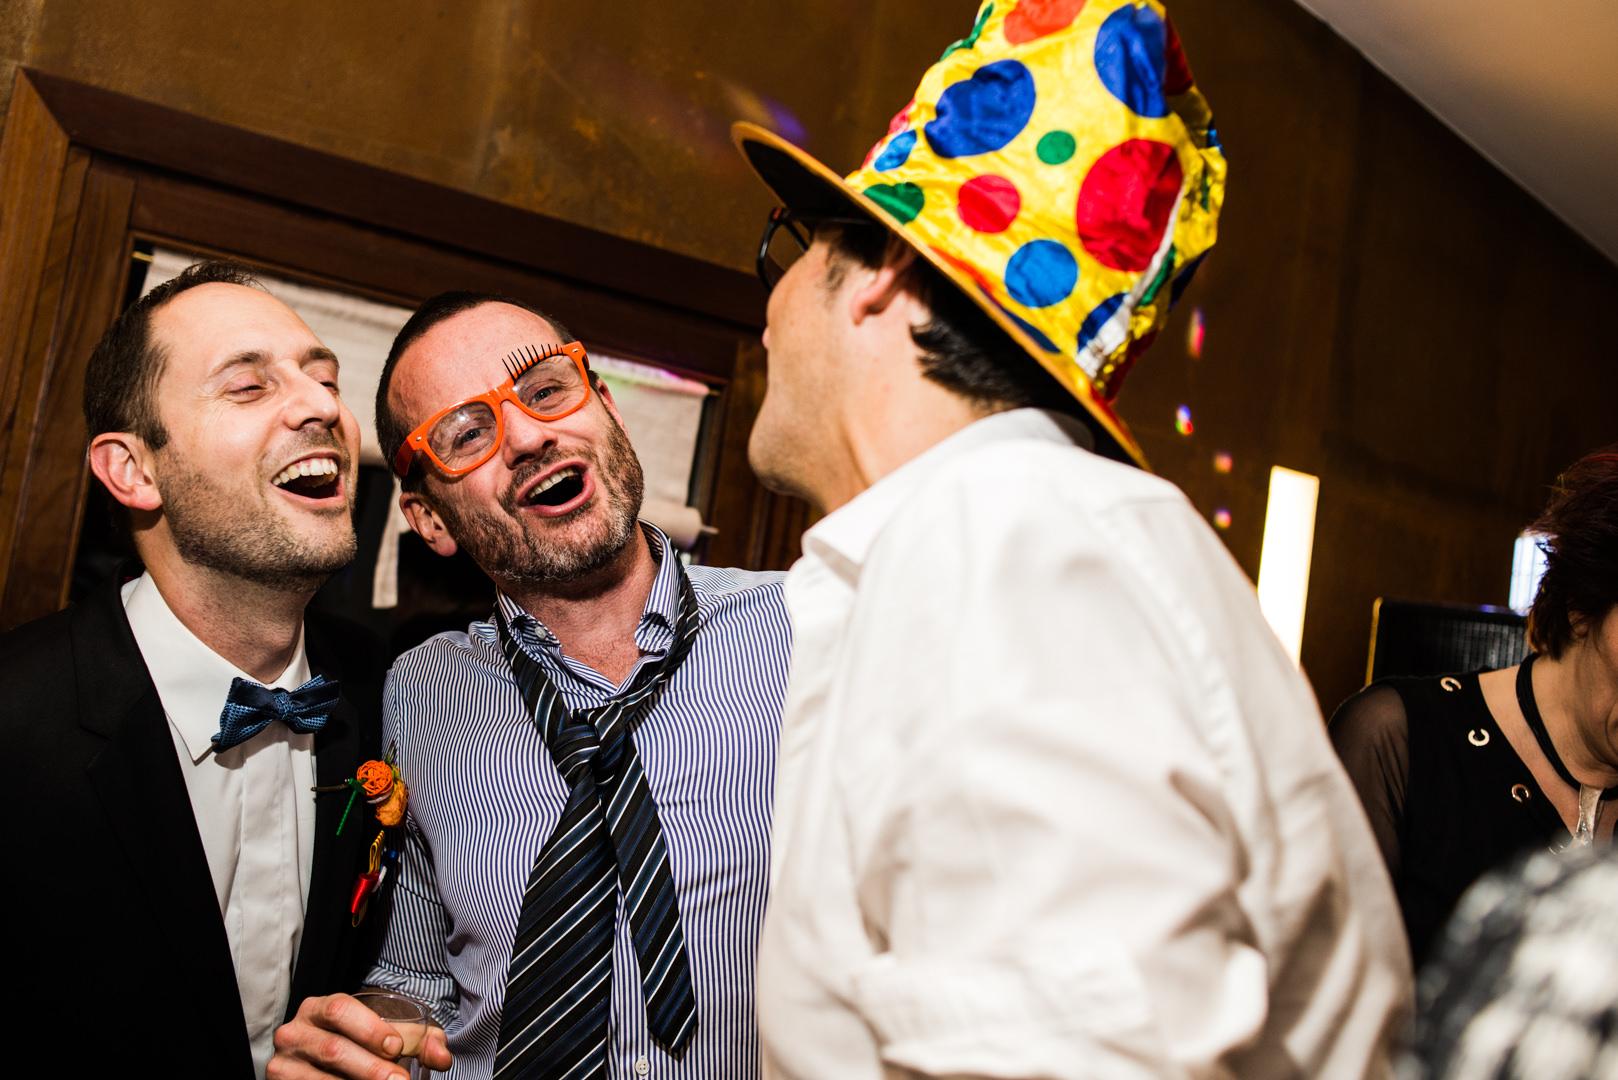 Same-sex-wedding-barcelona-boda- gay-samesex-engagement-Rafael-Torres-fotografo-bodas-sevilla-madrid-barcelona-wedding-photographer--61.jpg